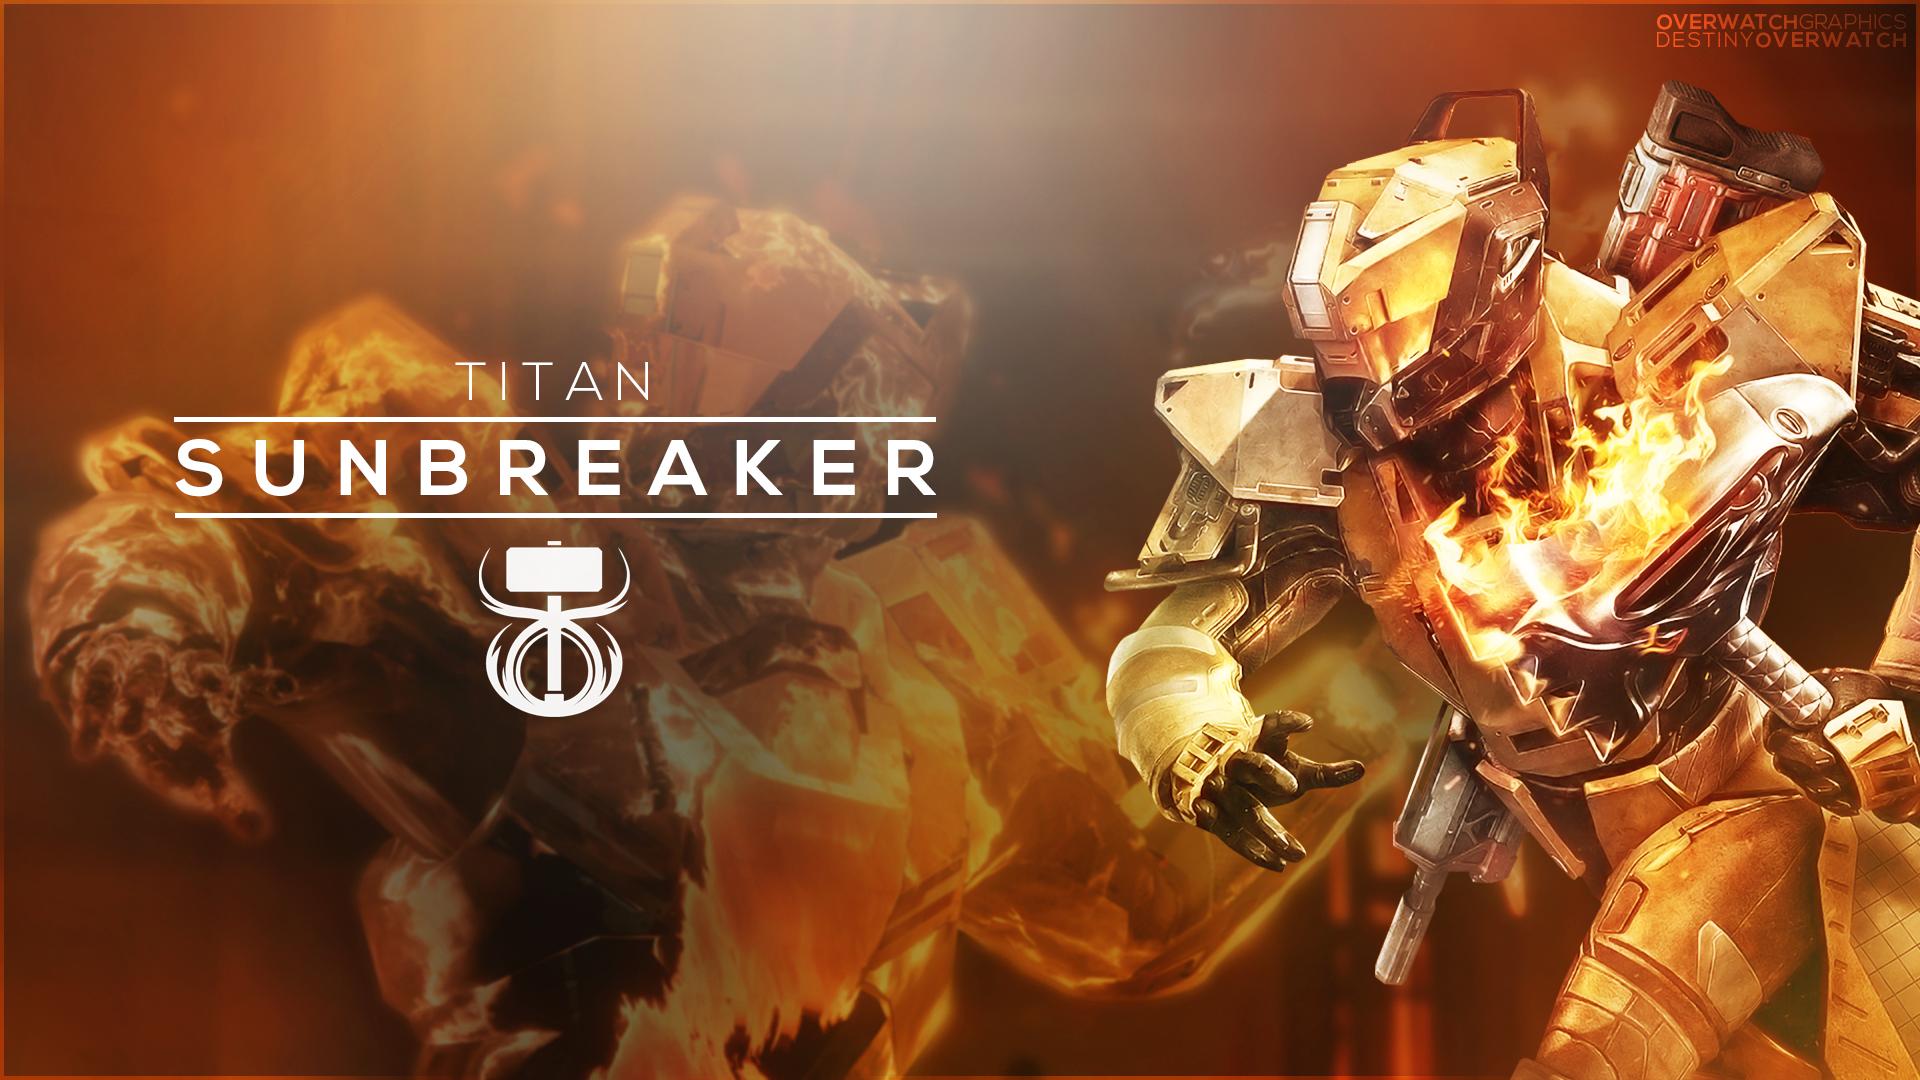 Destiny the Game - Sunbreaker Wallpaper by OverwatchGraphics